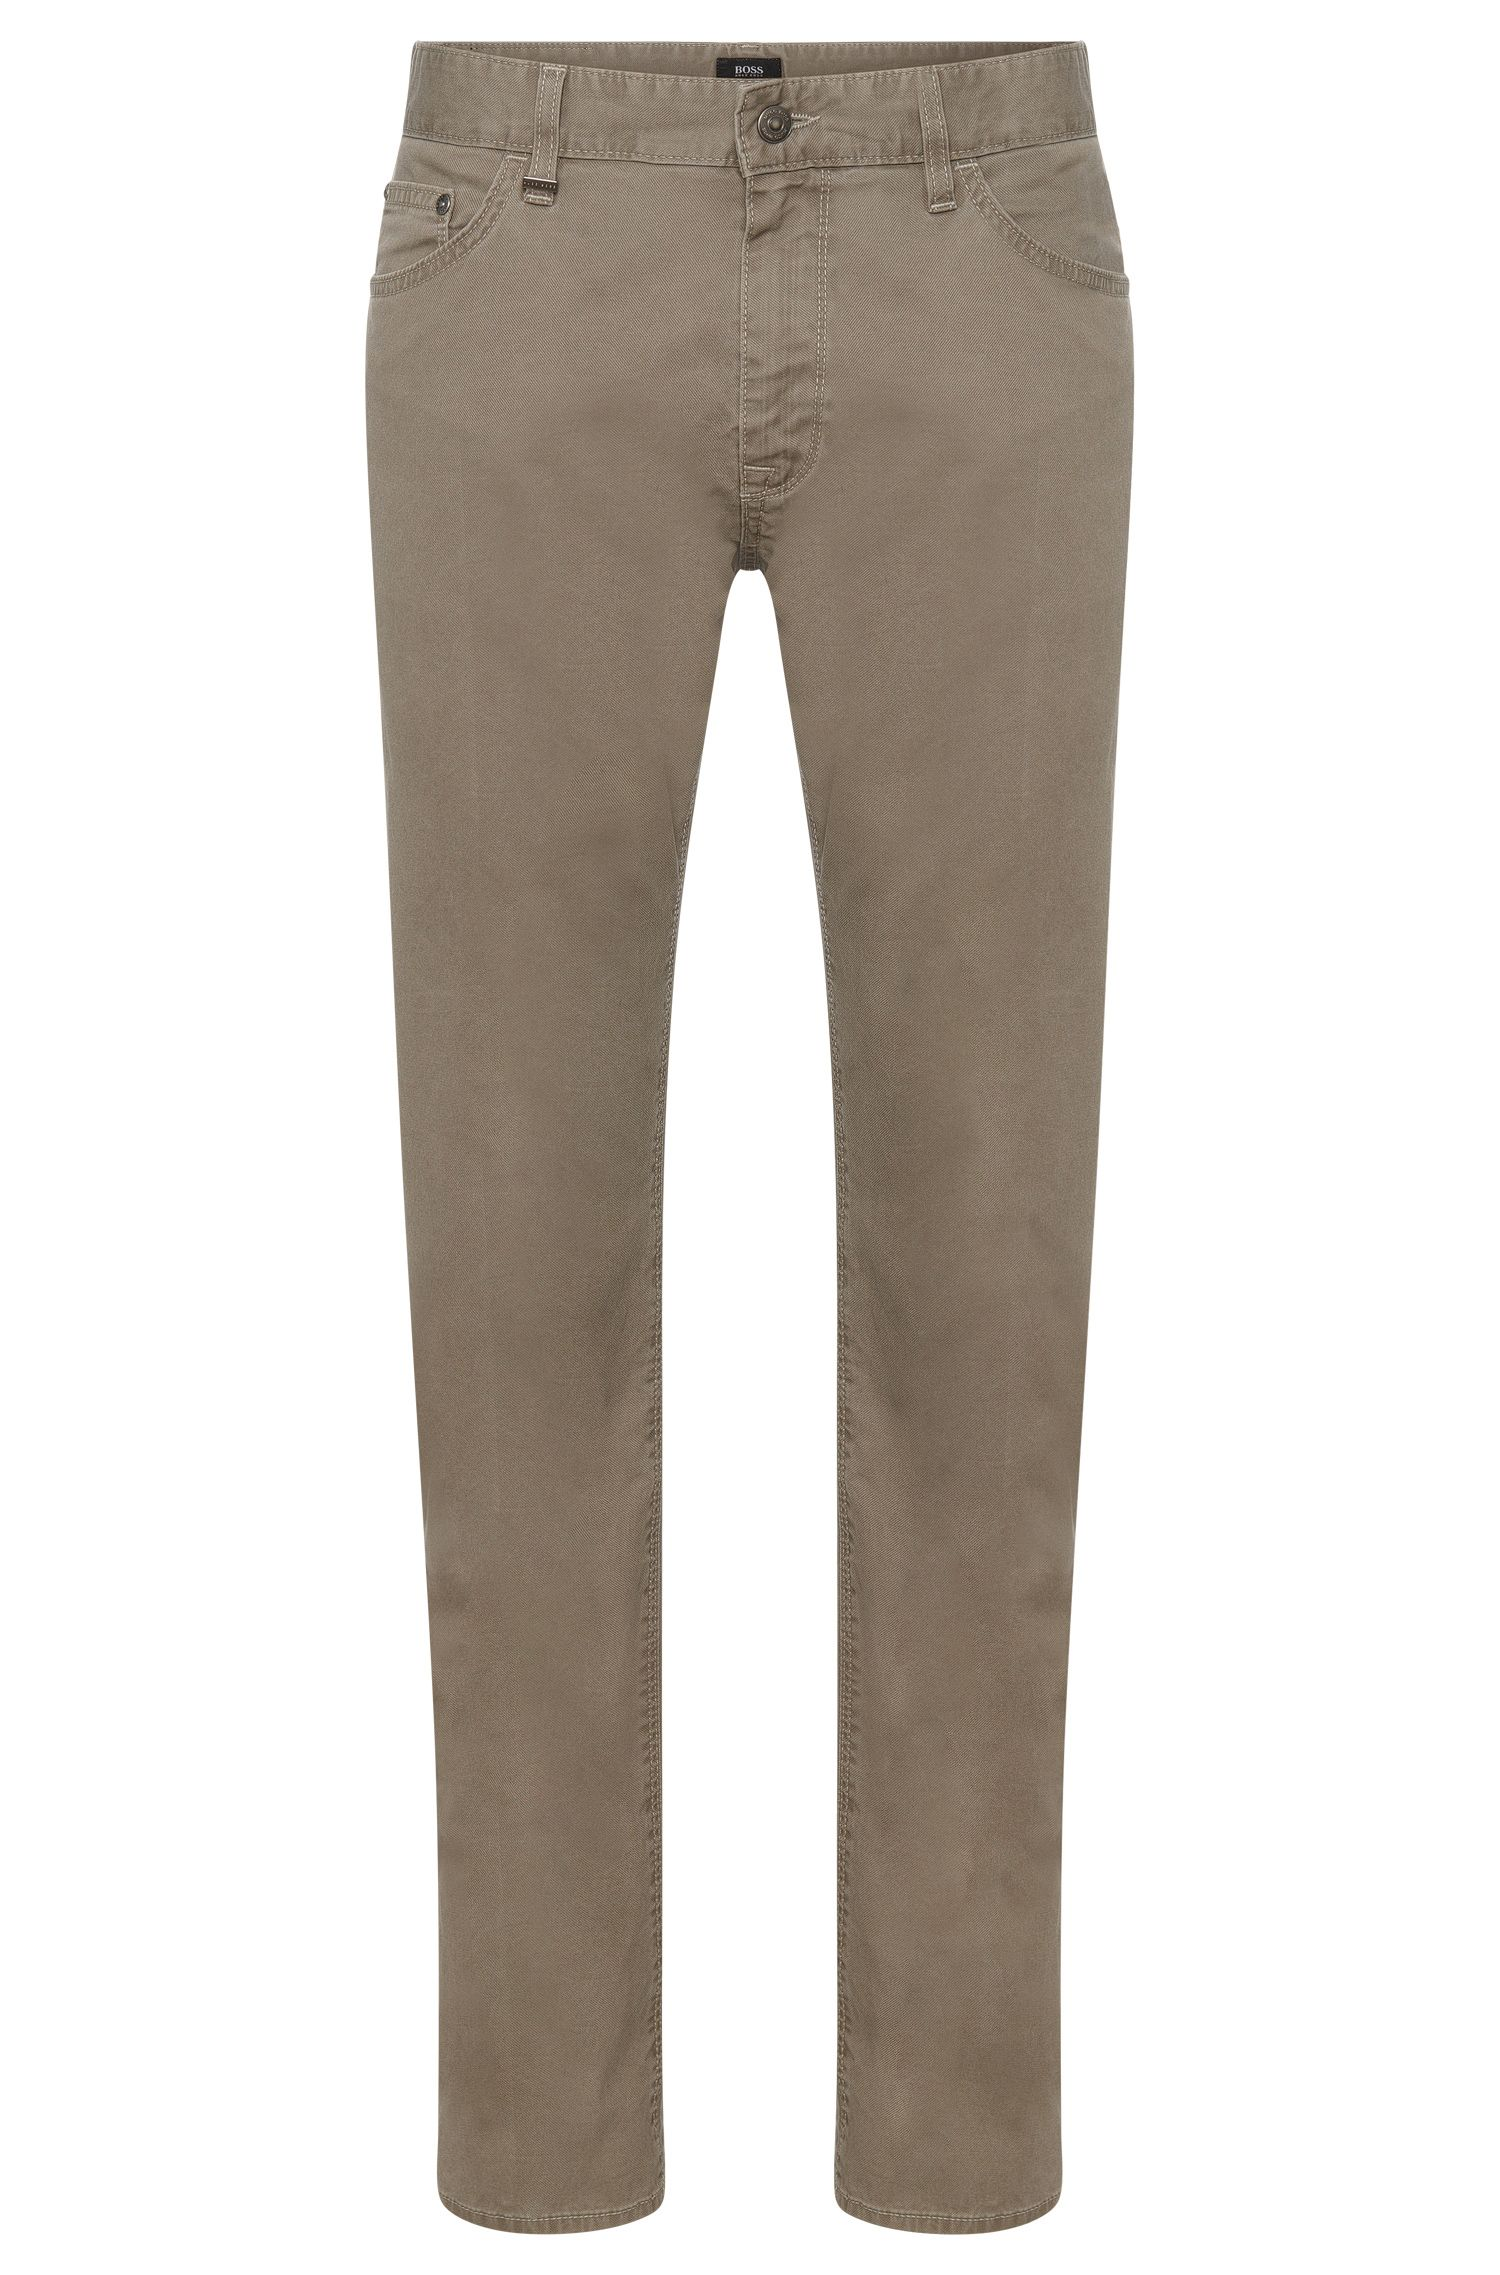 Unifarbene Regular-Fit Hose aus Stretch-Baumwolle: 'Maine3-20'